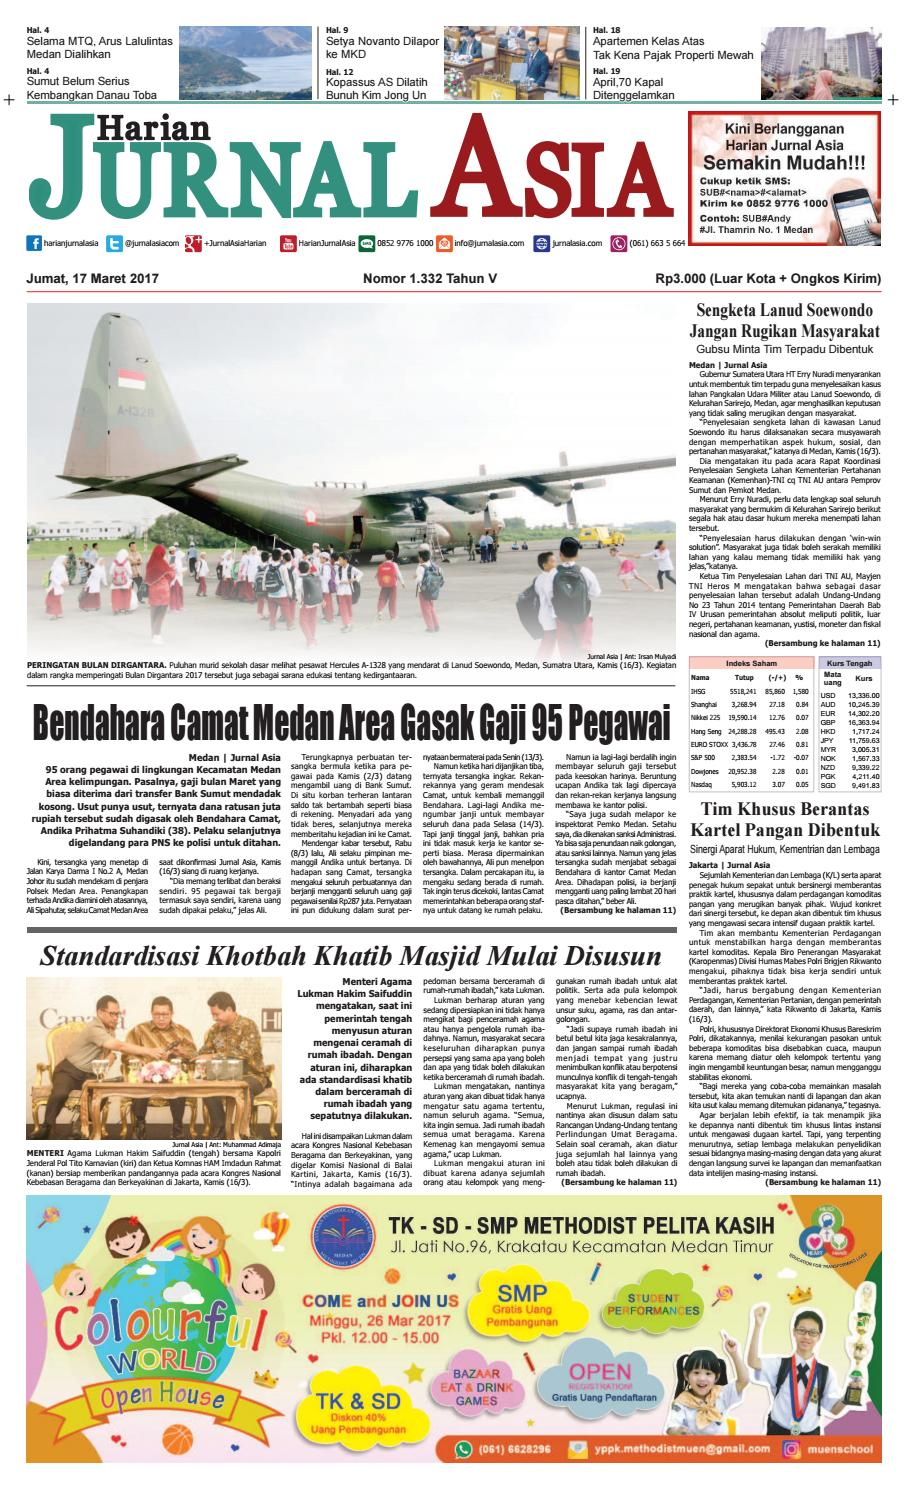 Harian Jurnal Asia Edisi Jumat 17 Maret 2017 By Kopi Bubuk Ridha Utama Smg Medan Issuu